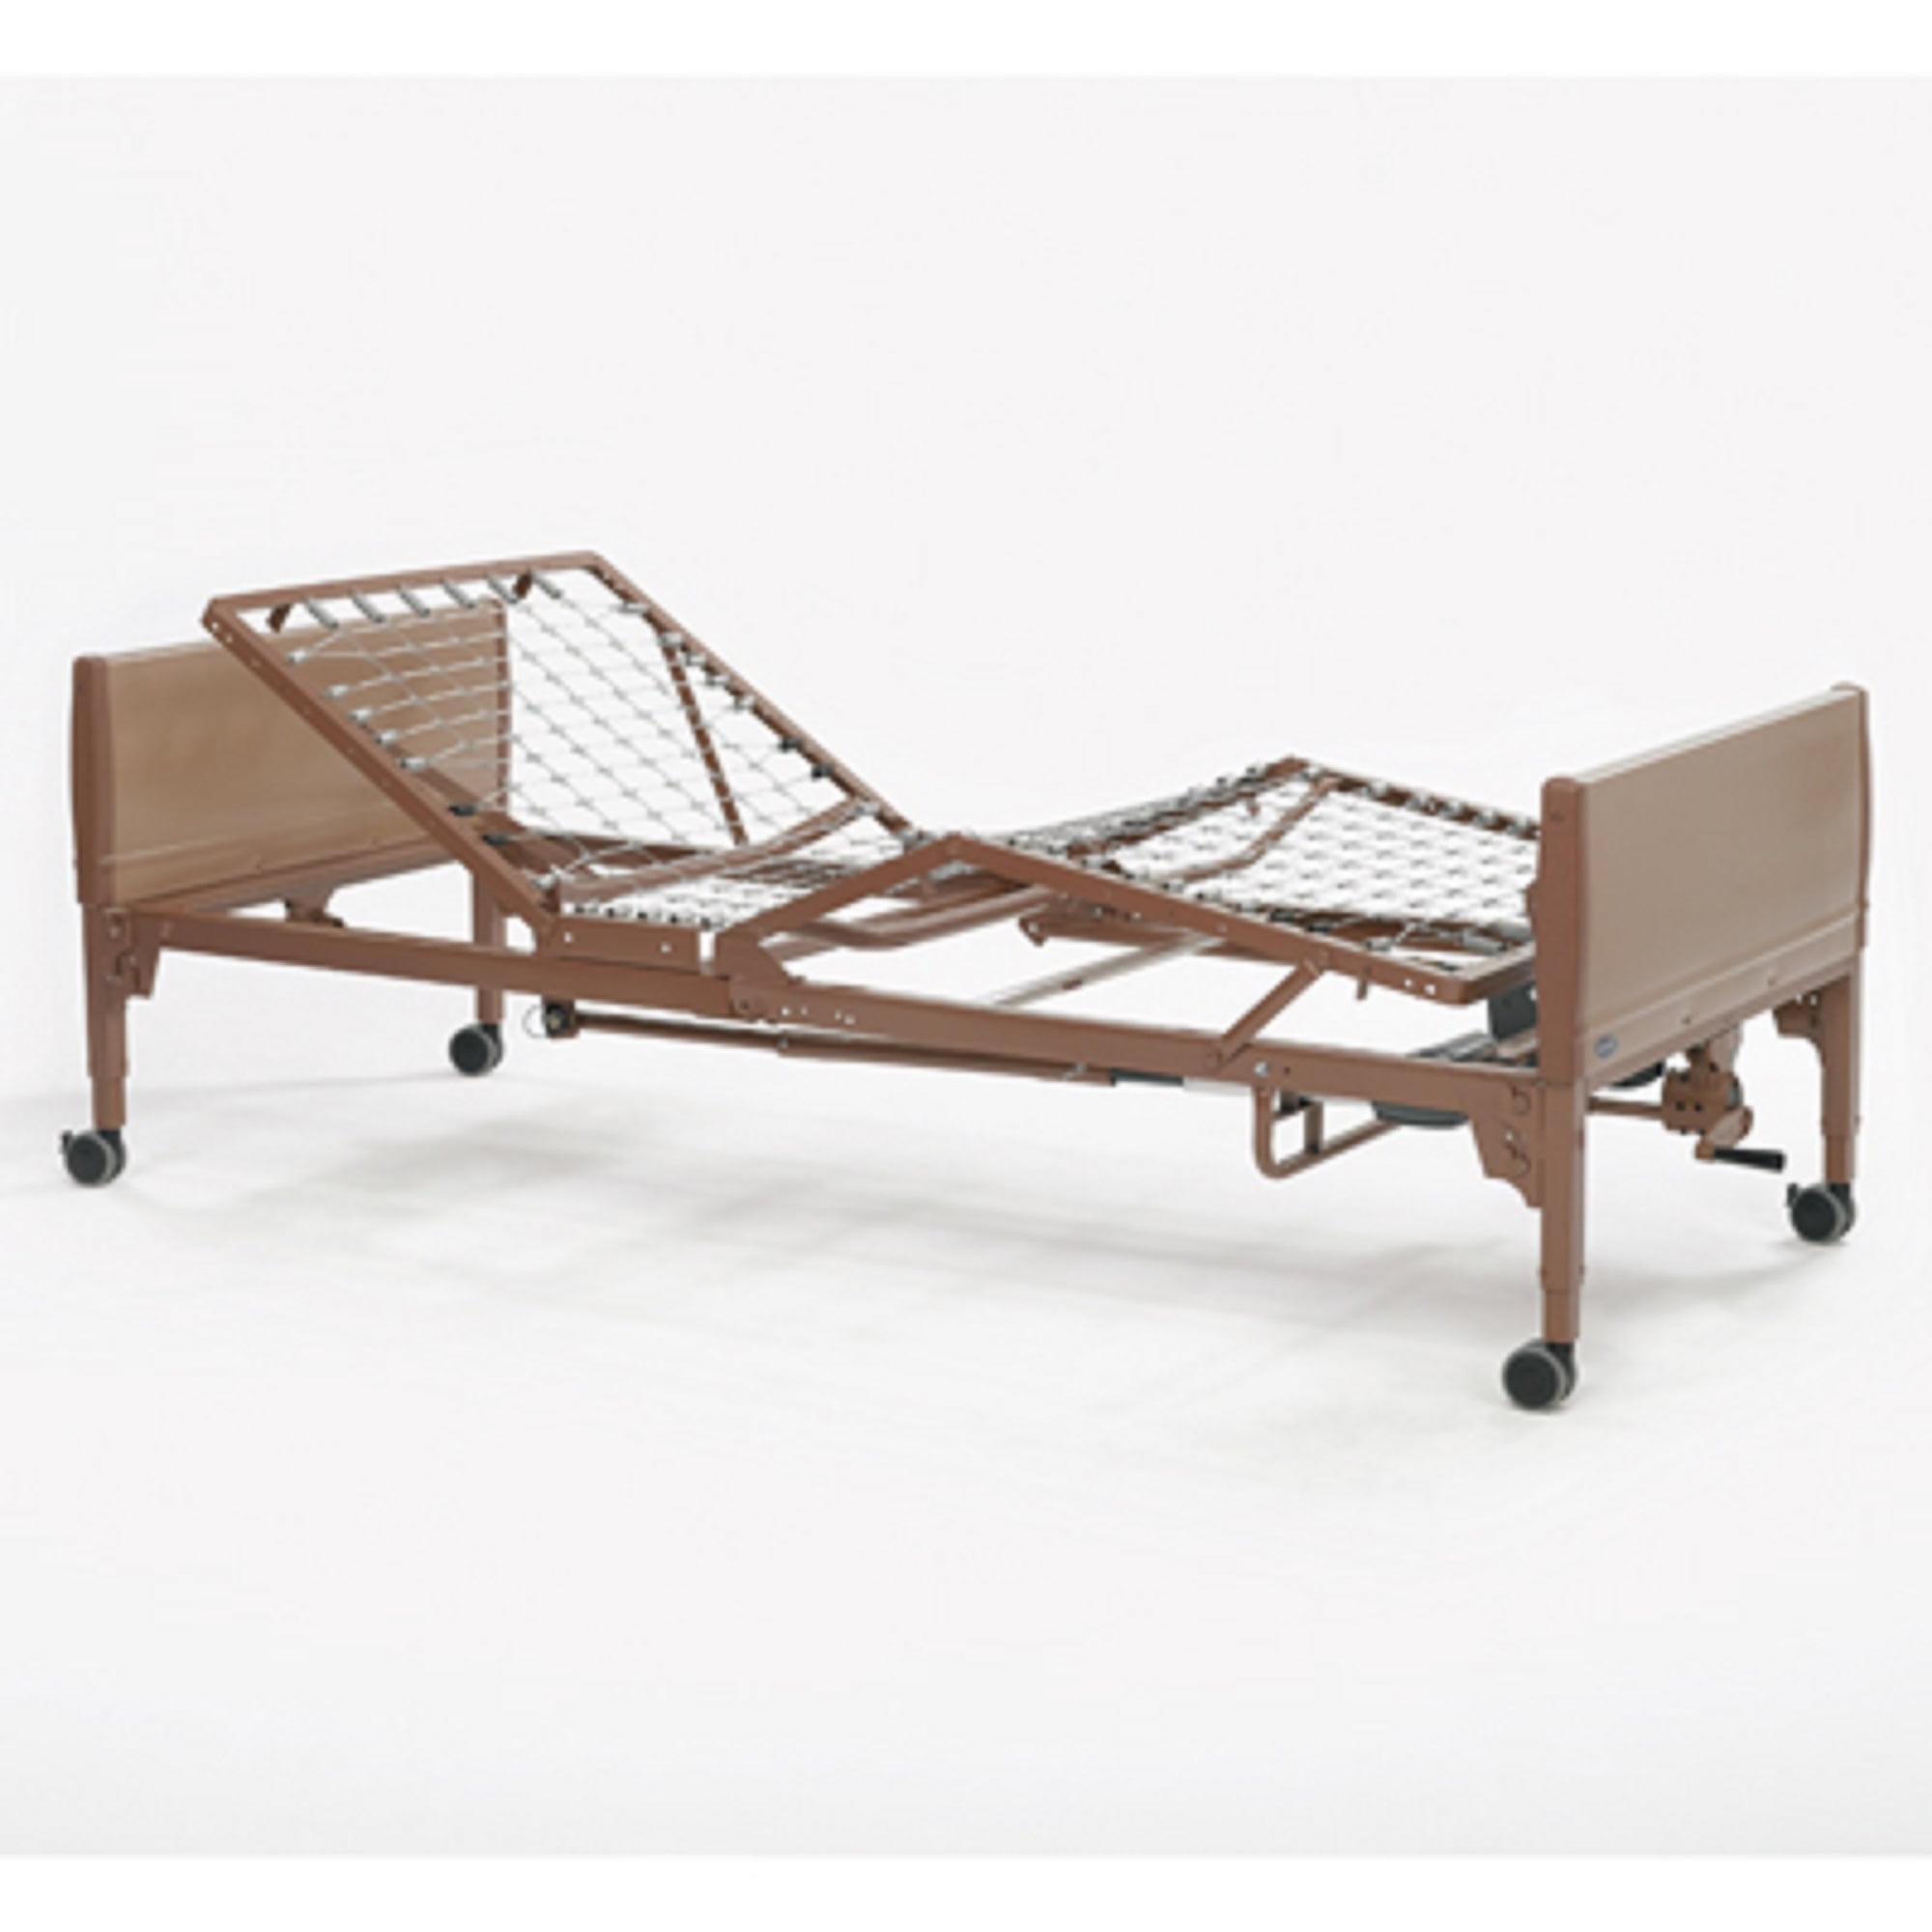 Invacare Semi-Electric Homecare Bed with Foam Mattress an...